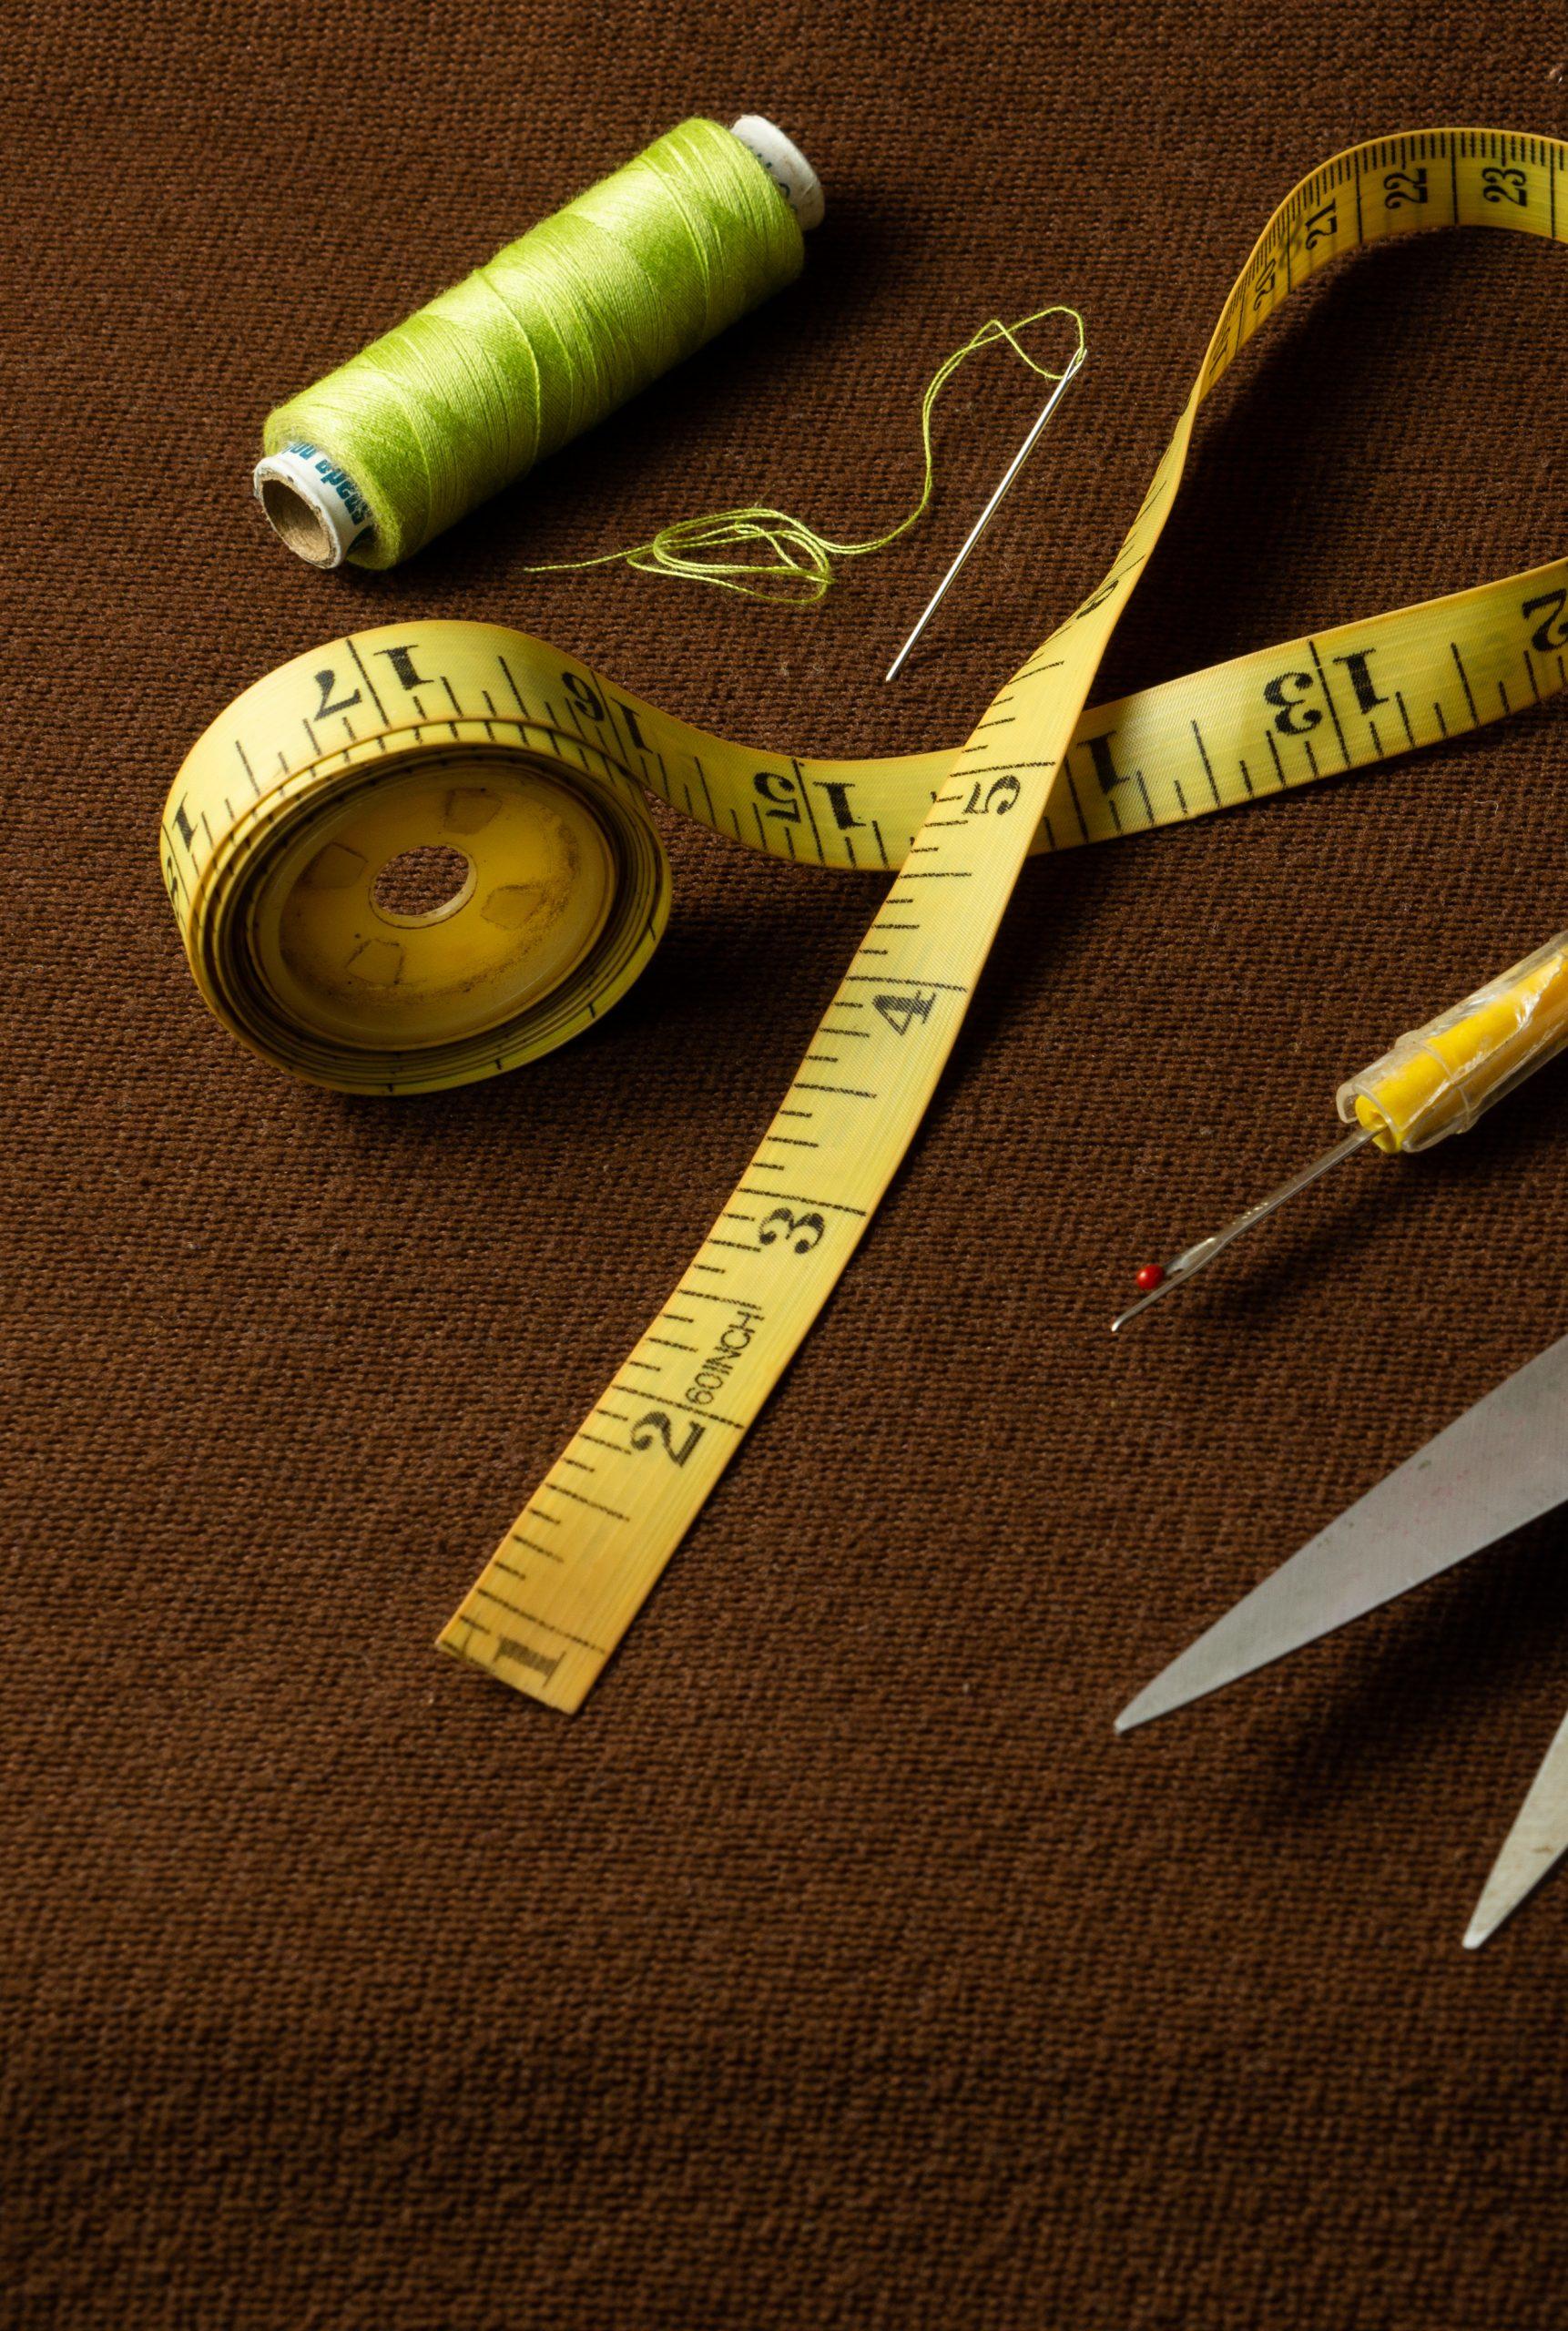 Tailoring materials kept on a matte